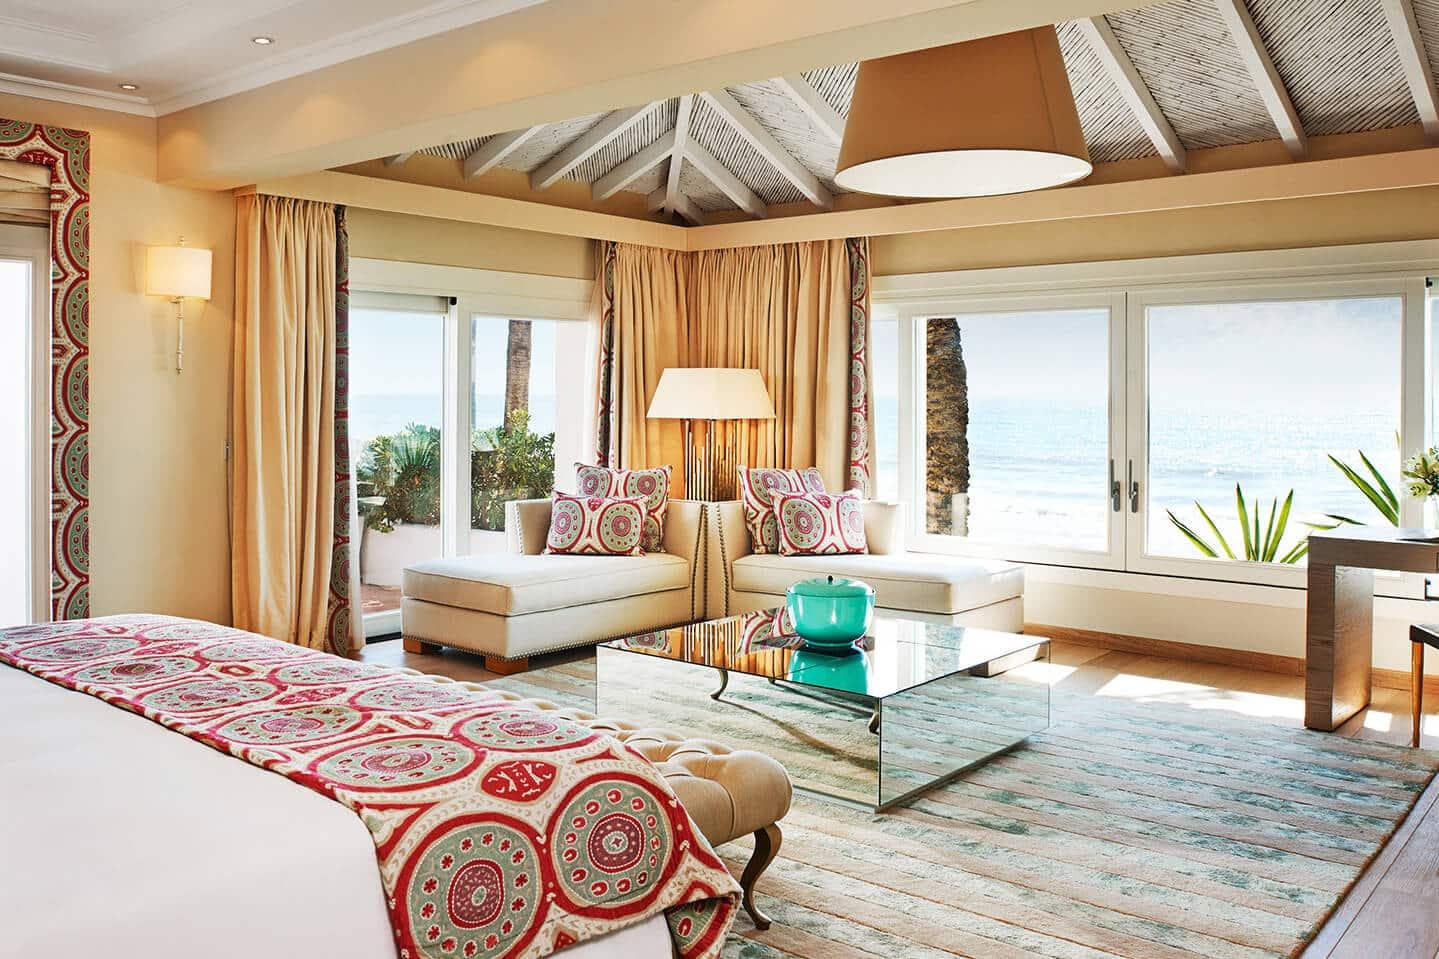 Kust hotels Marbella